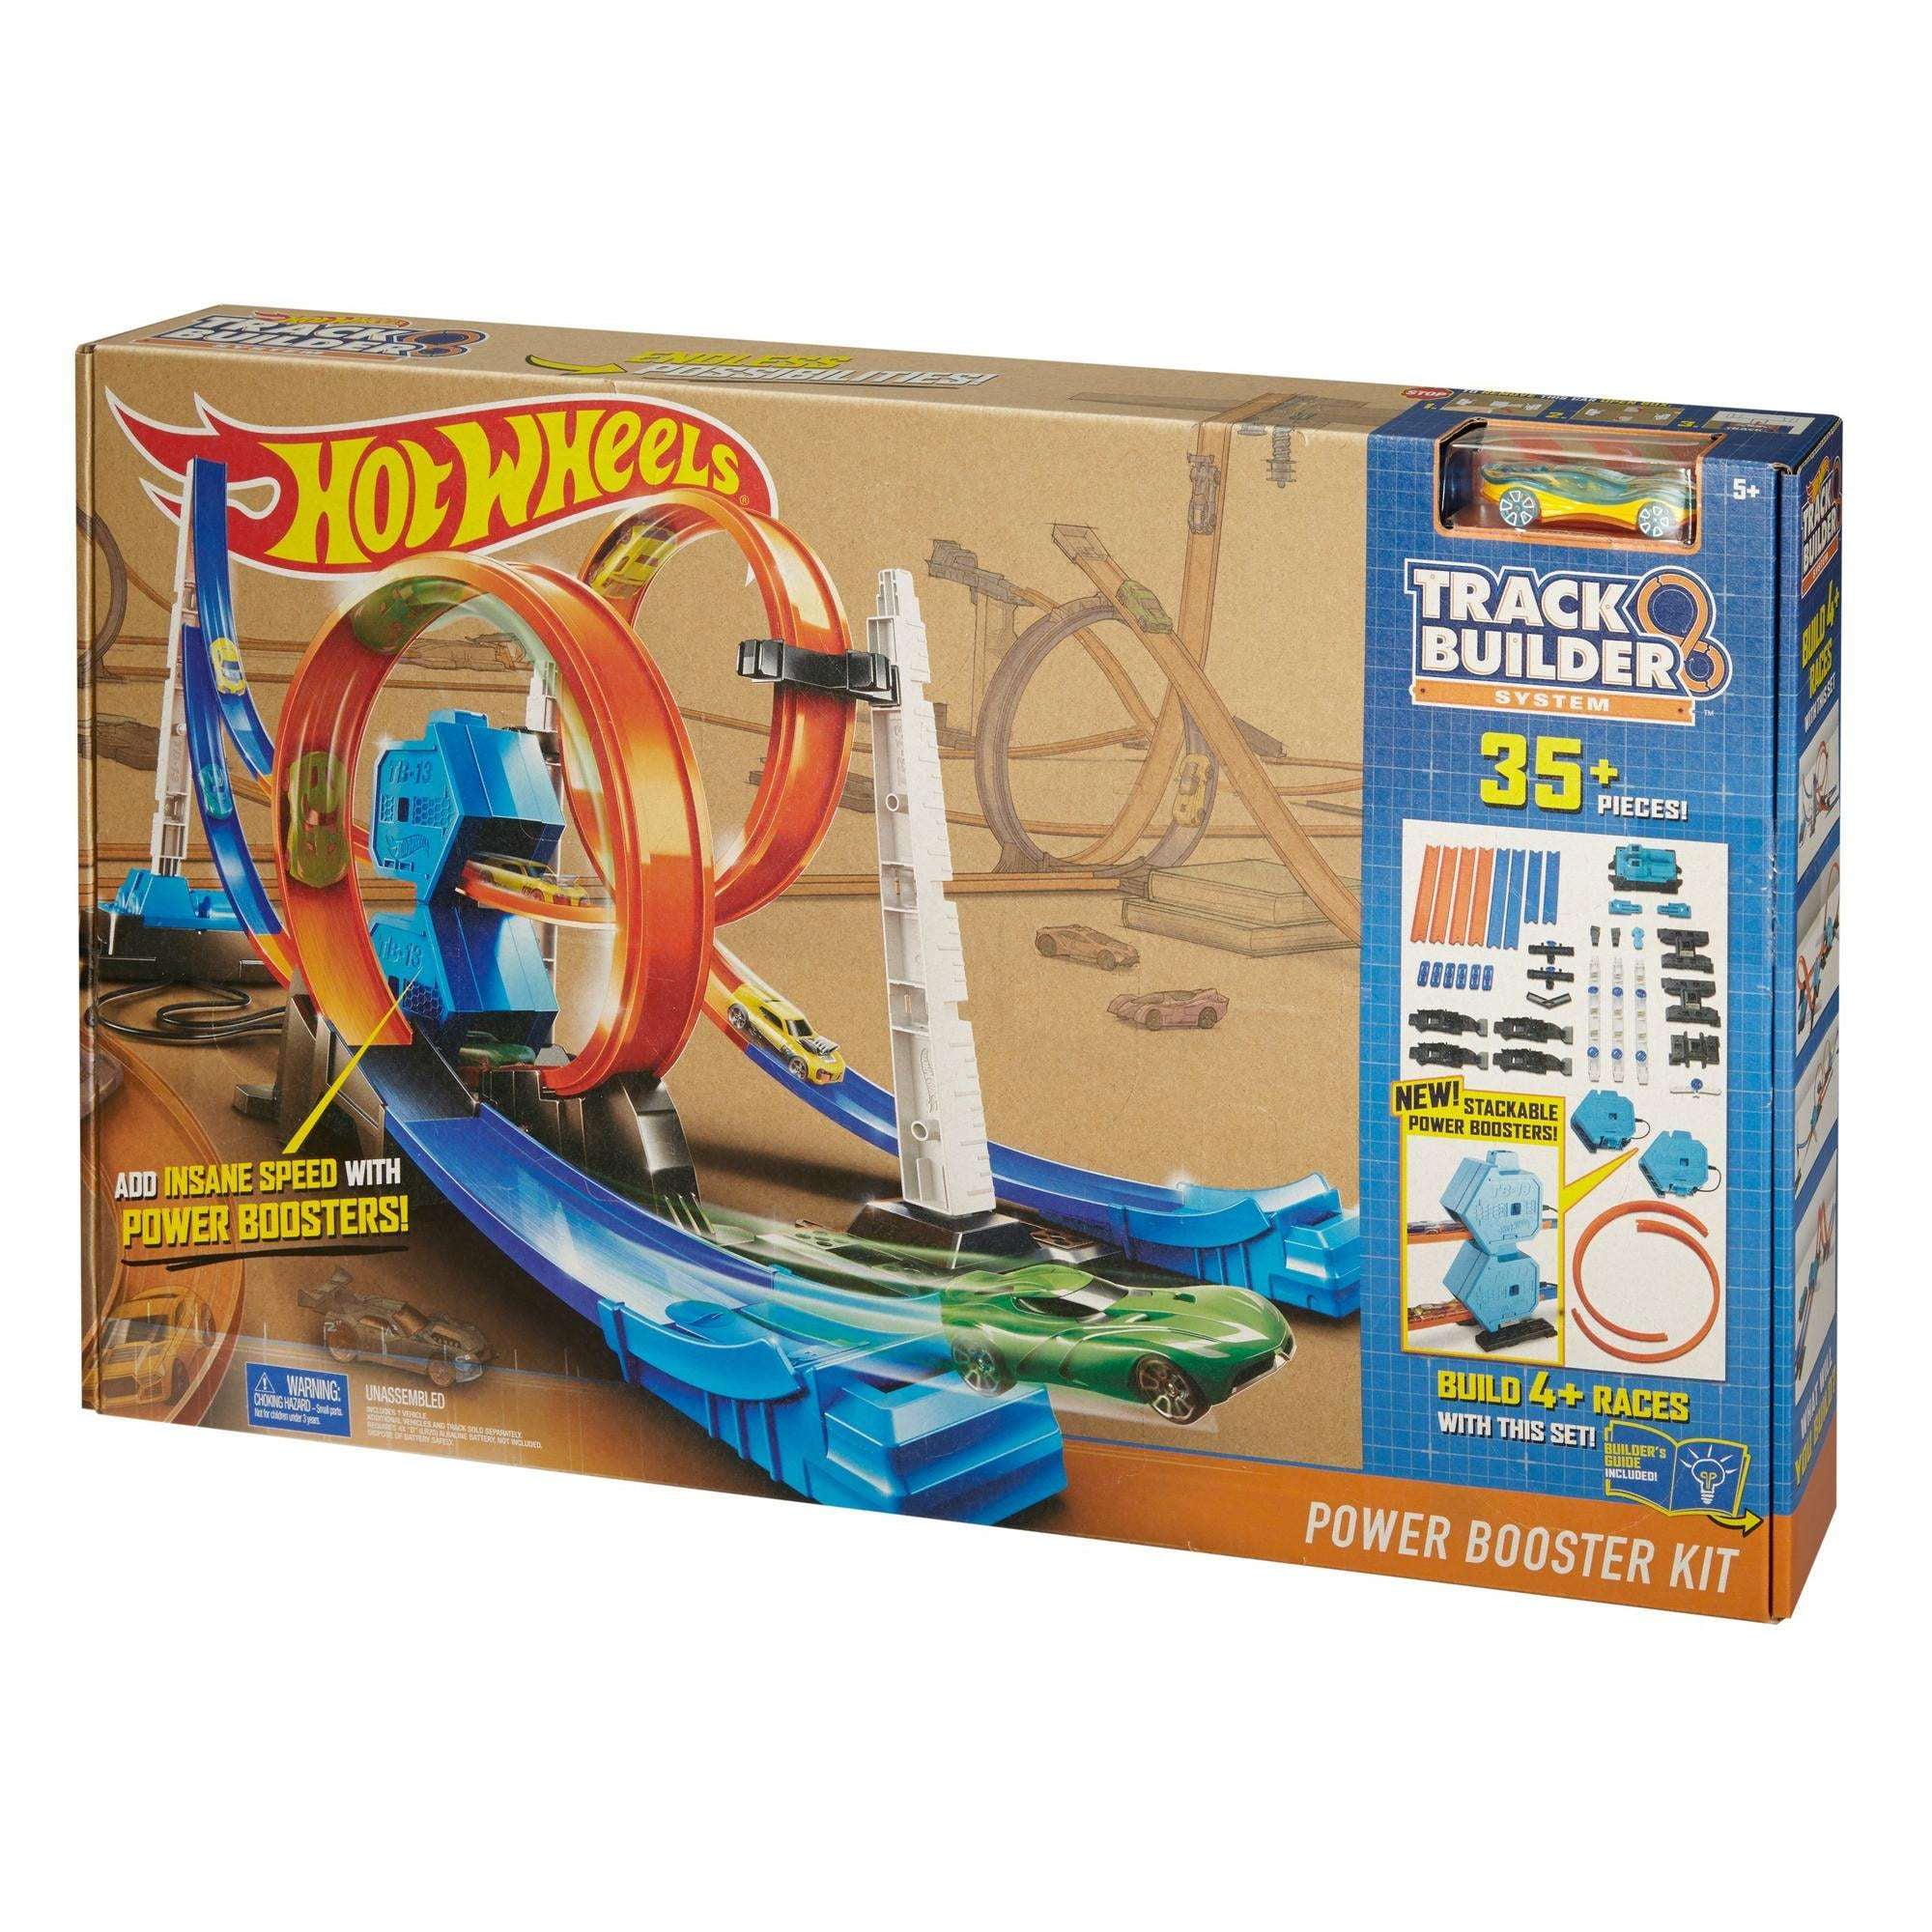 36c41b59149e7 Hot Wheels Track Builder System Power Booster Kit - Walmart.com